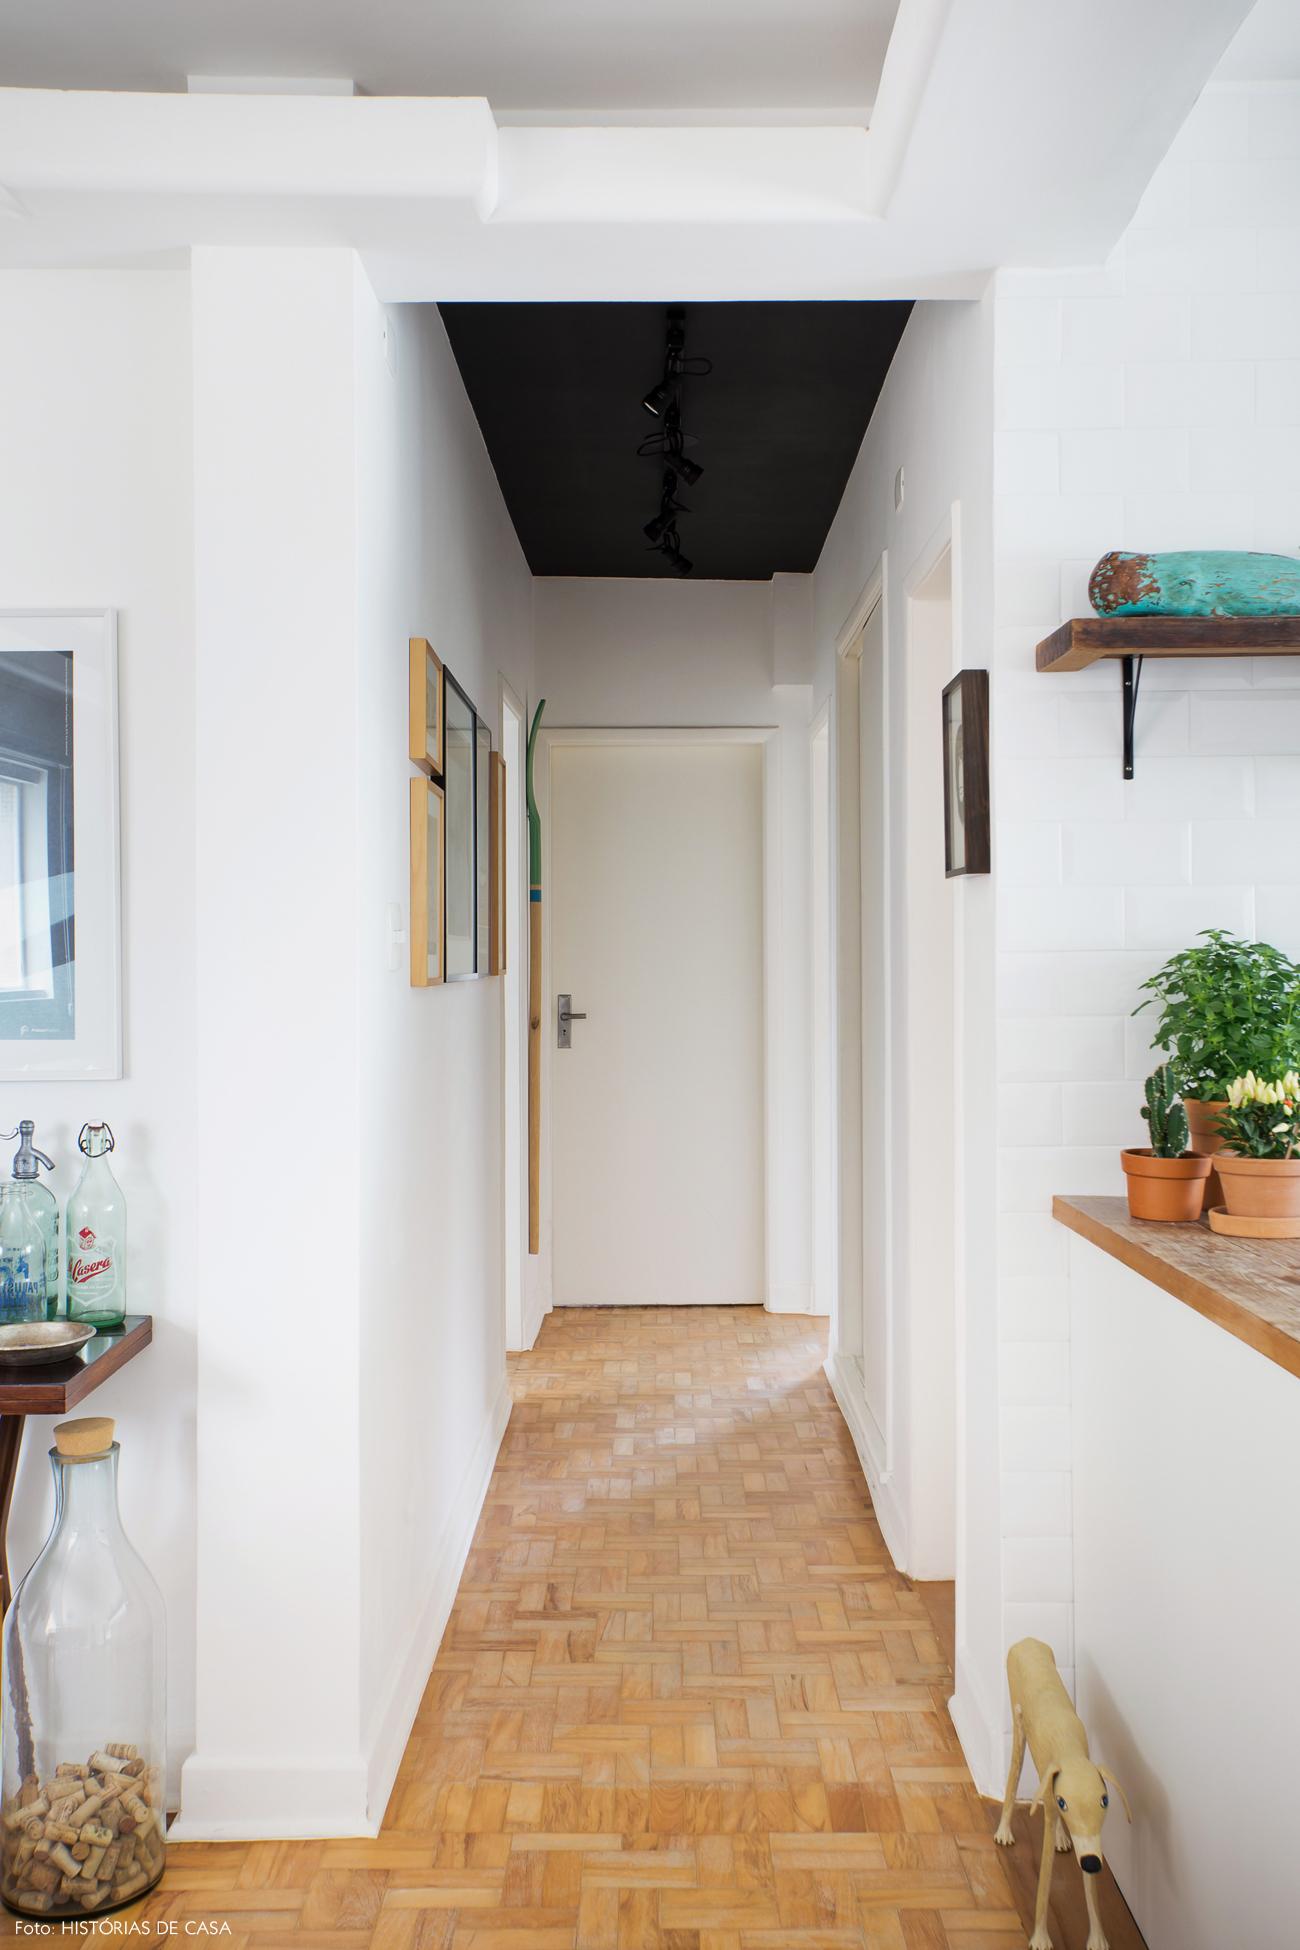 13-decoracao-corredor-apartamento-teto-pintado-preto